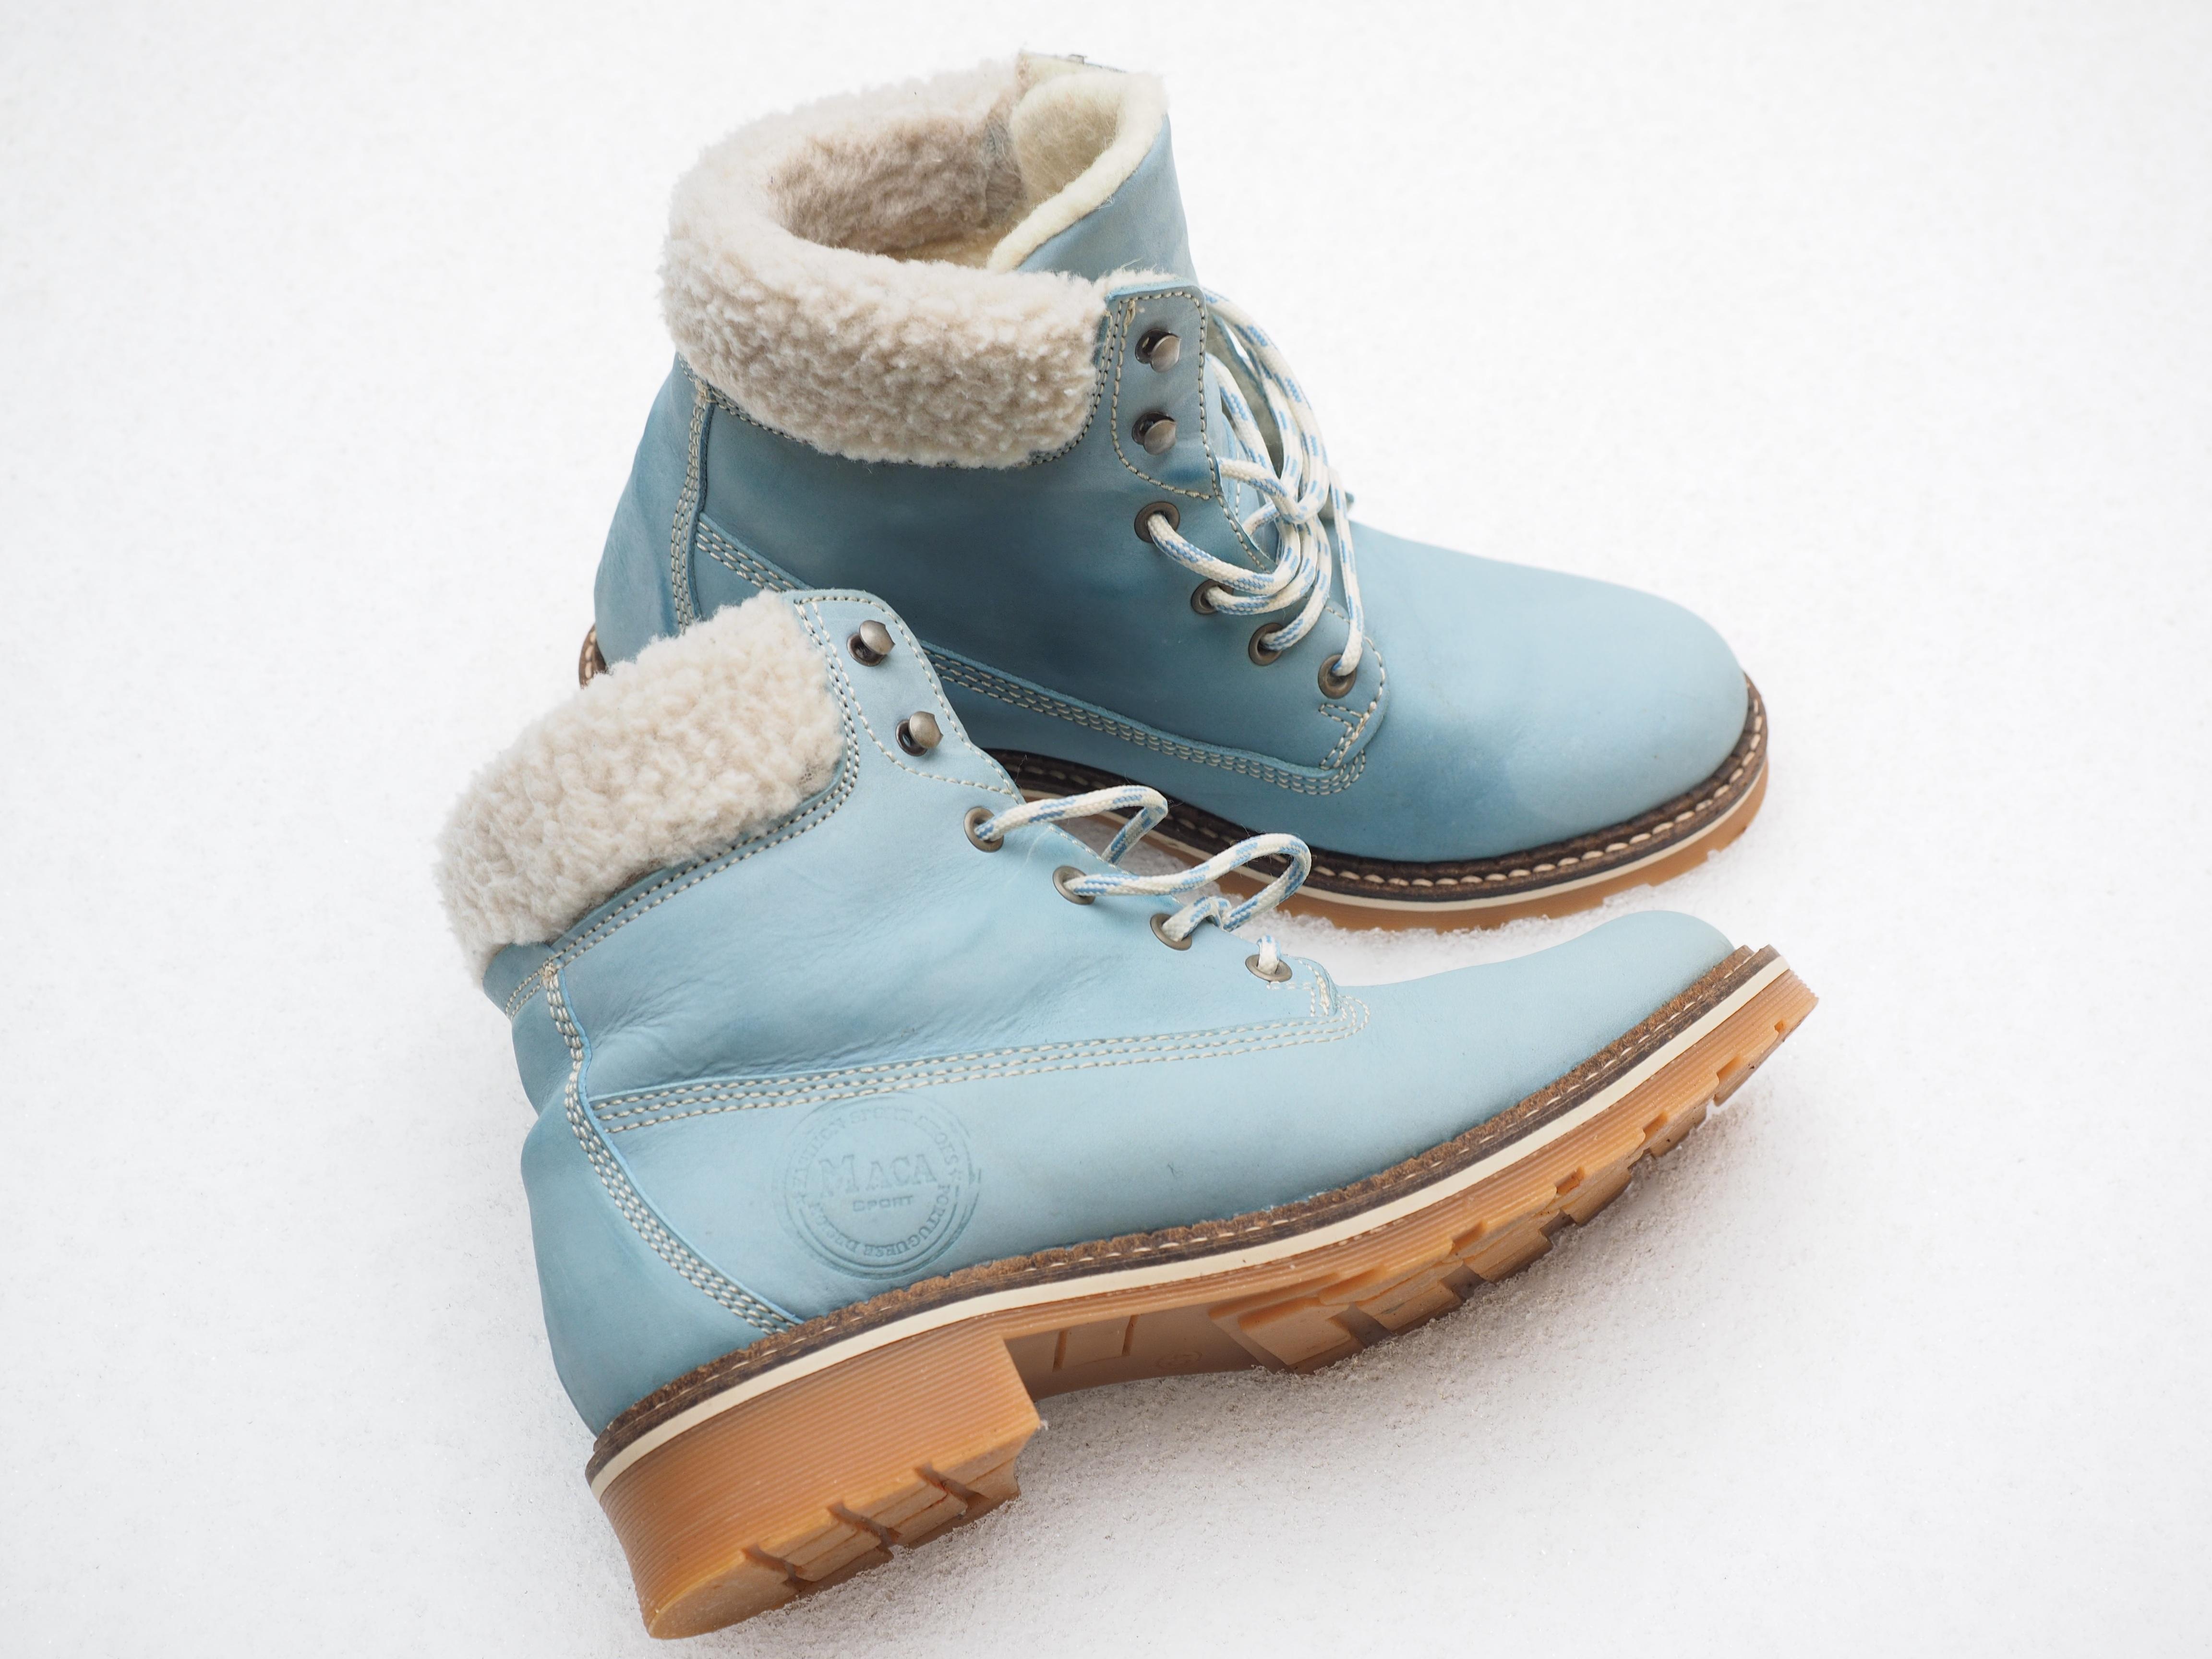 Free Images   Warm  Boot  Leg  Clothing  Human Body